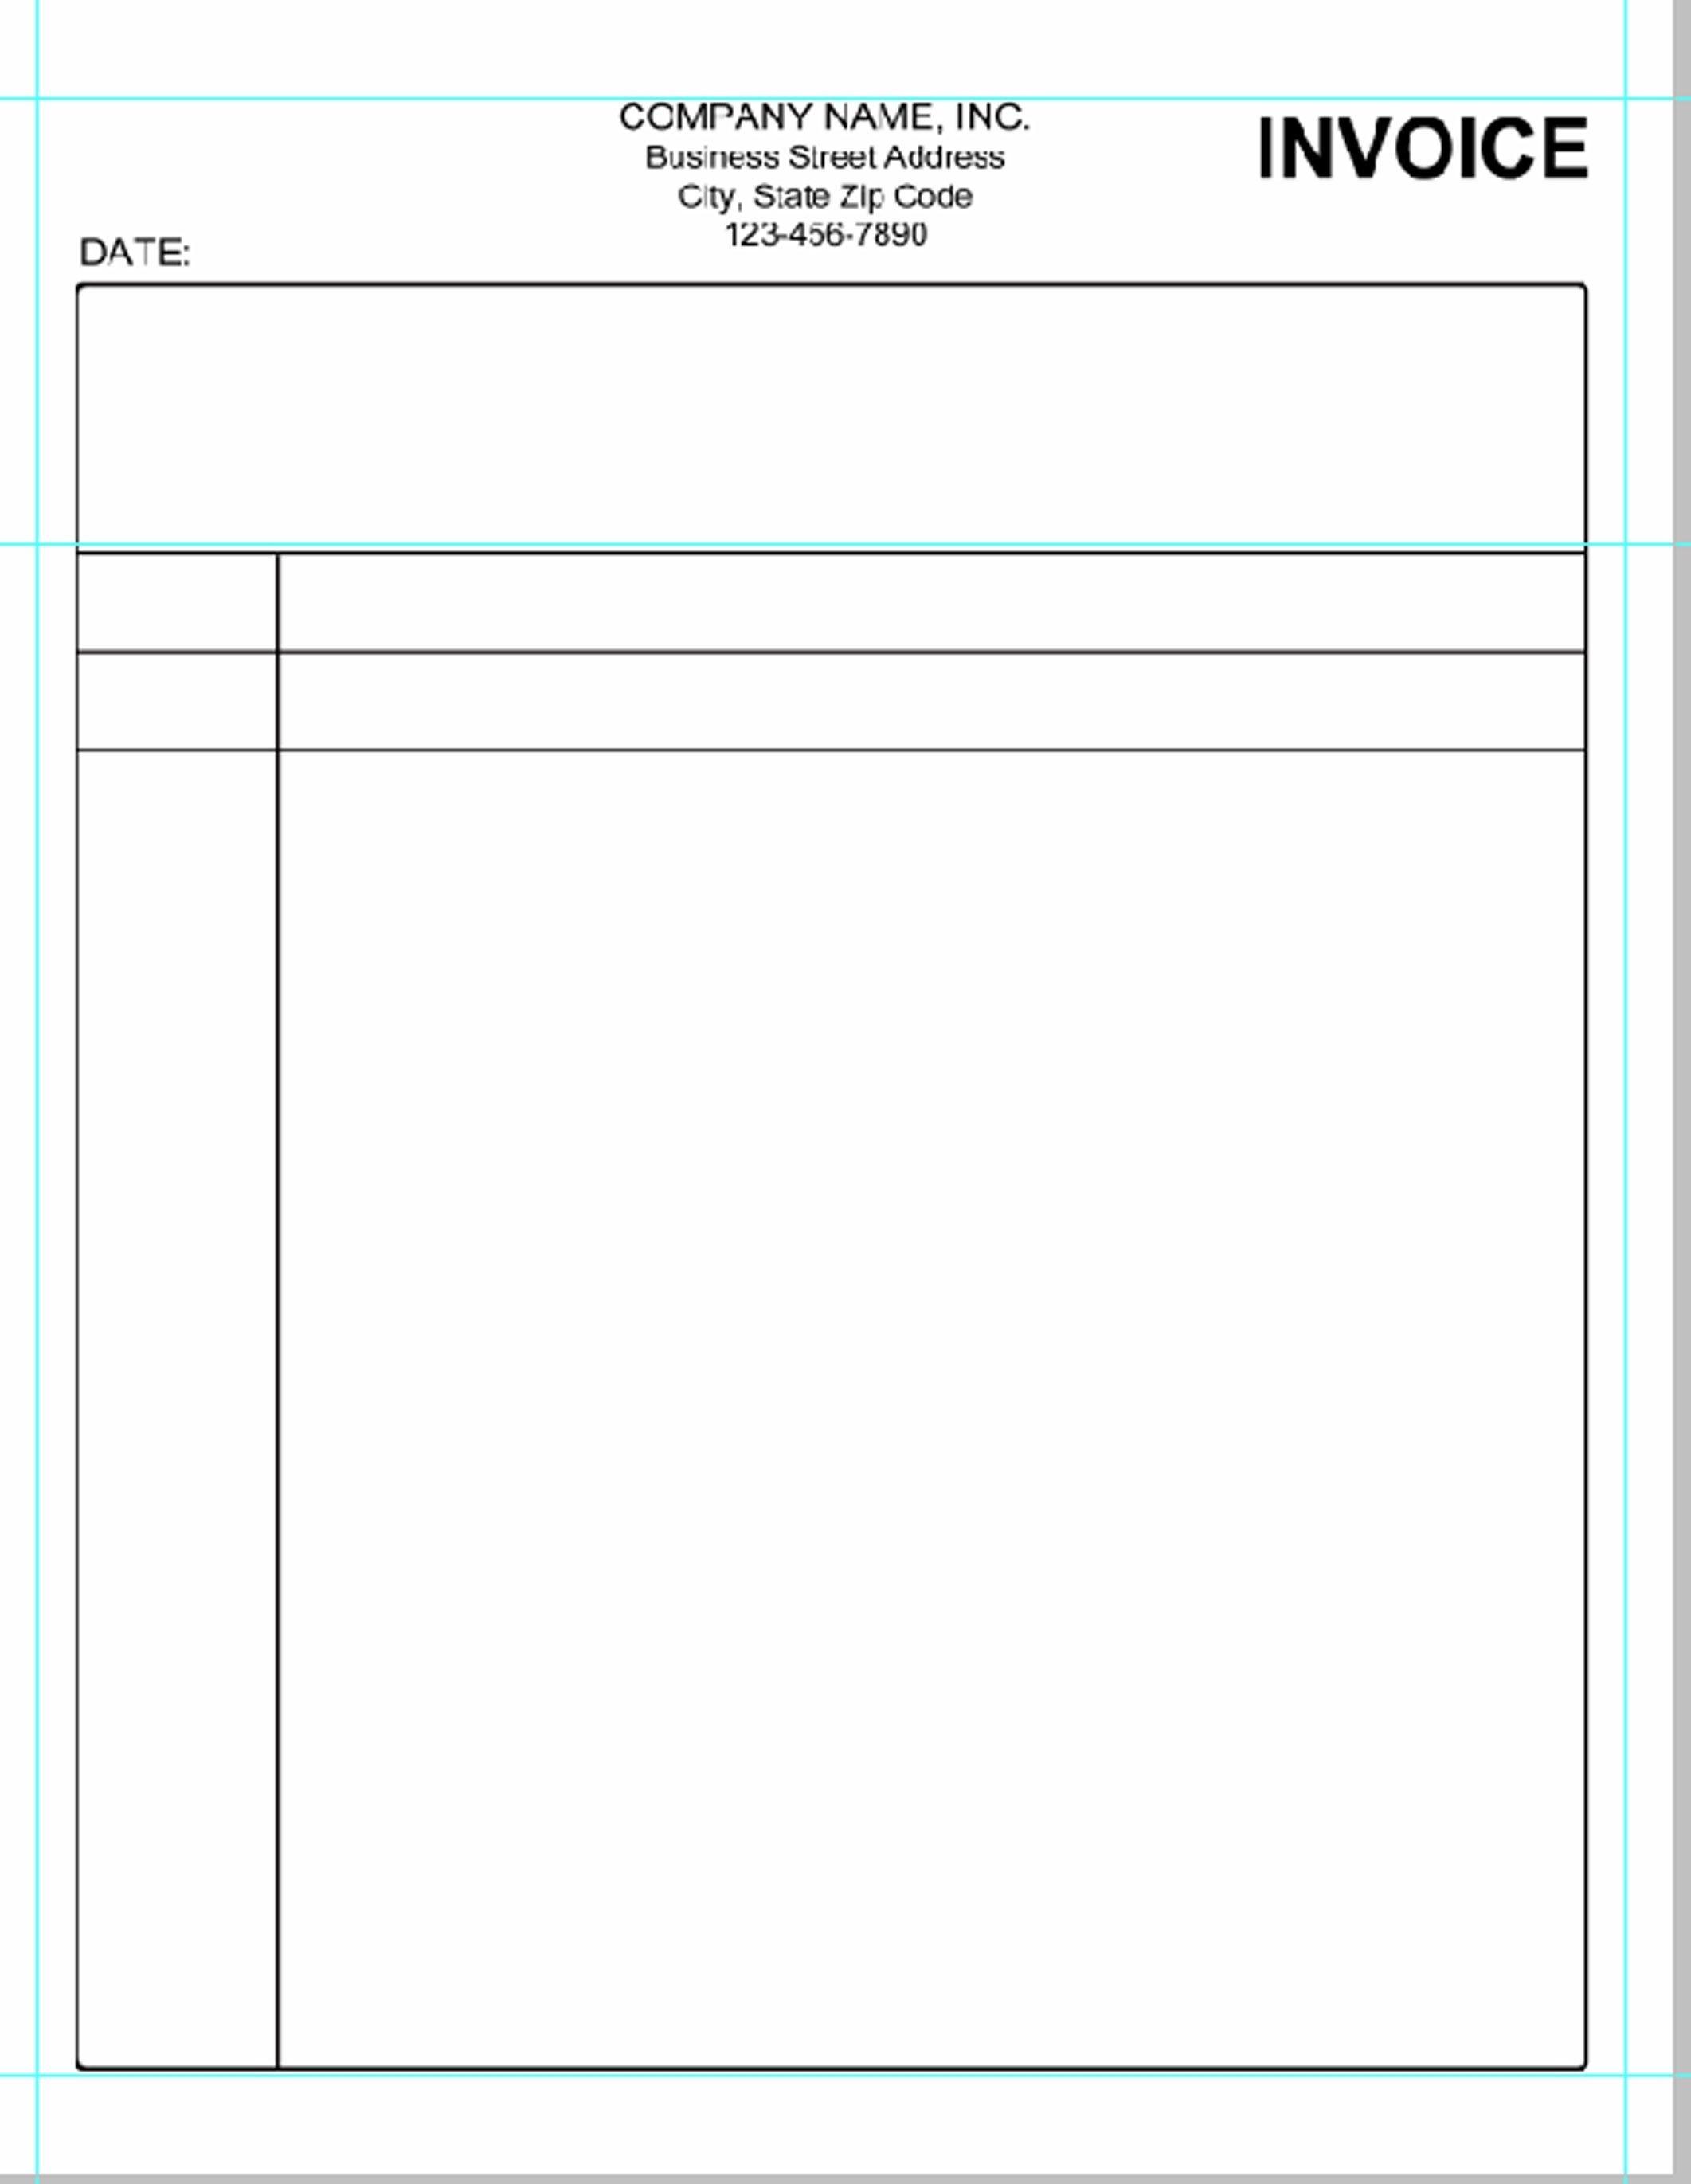 blank invoice template microsoft word invoice template free basic blank invoice form